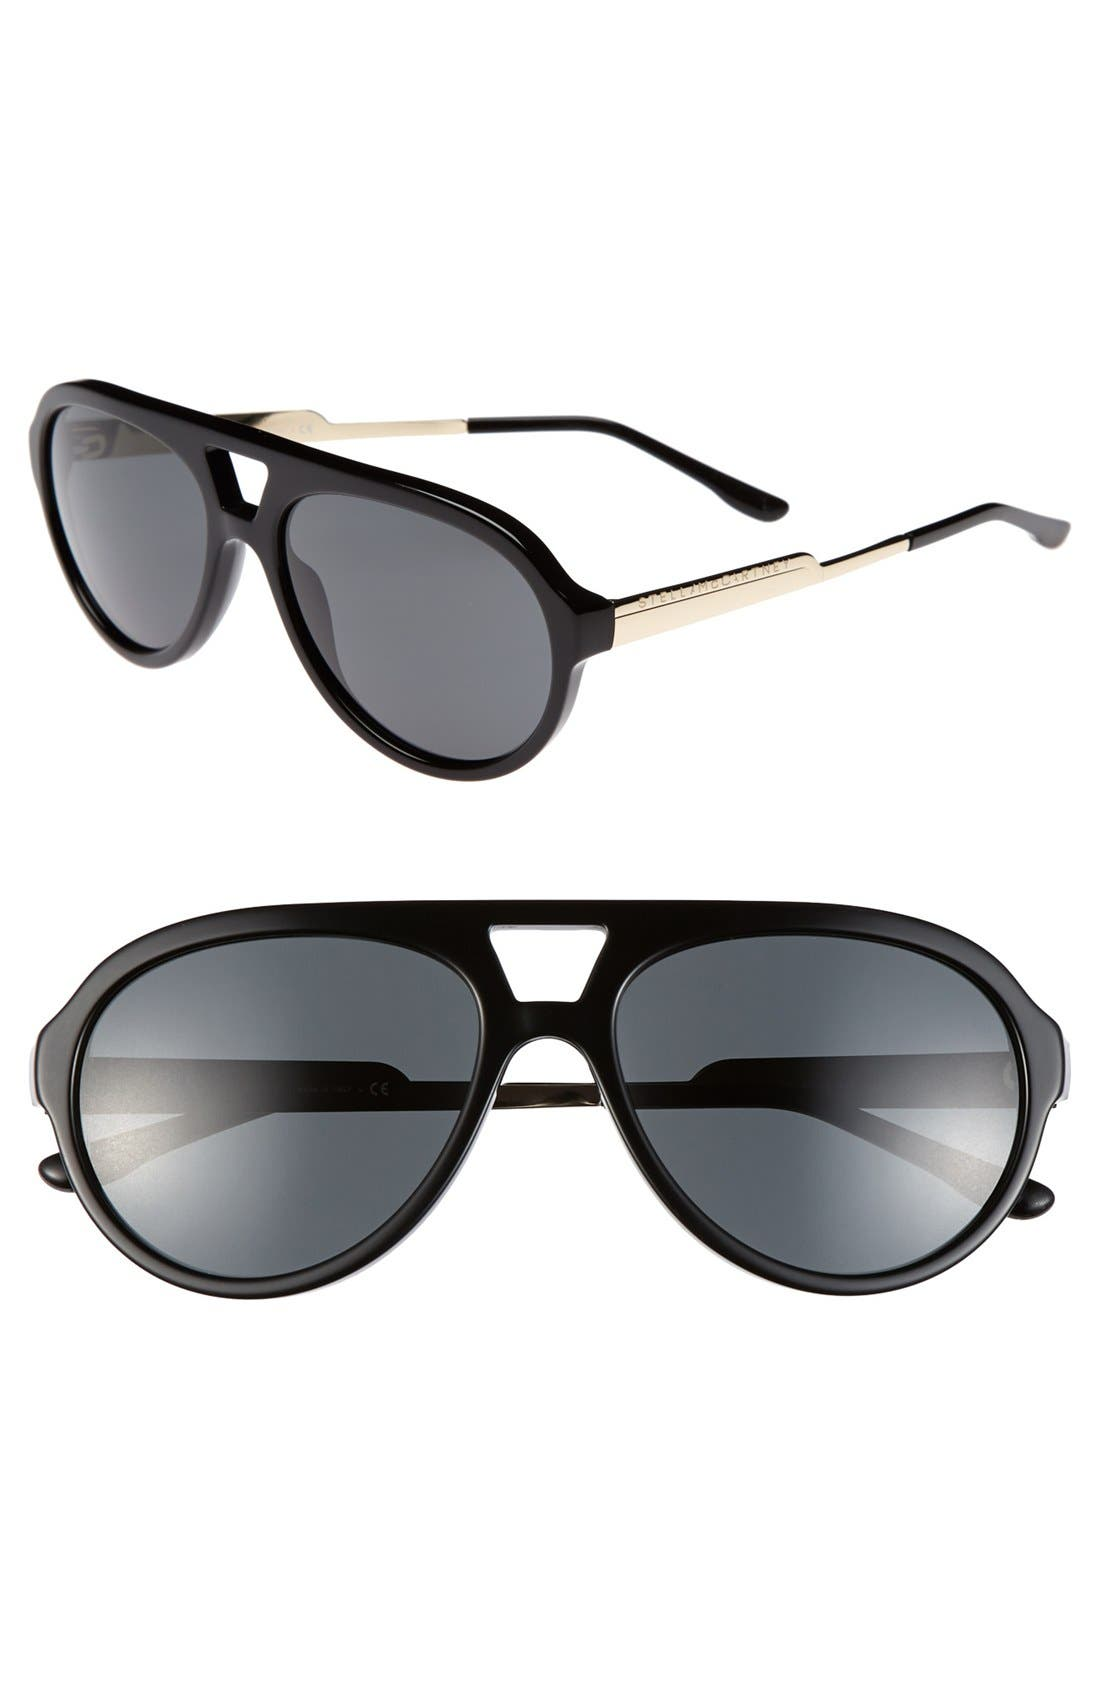 Main Image - Stella McCartney 57mm Aviator Sunglasses